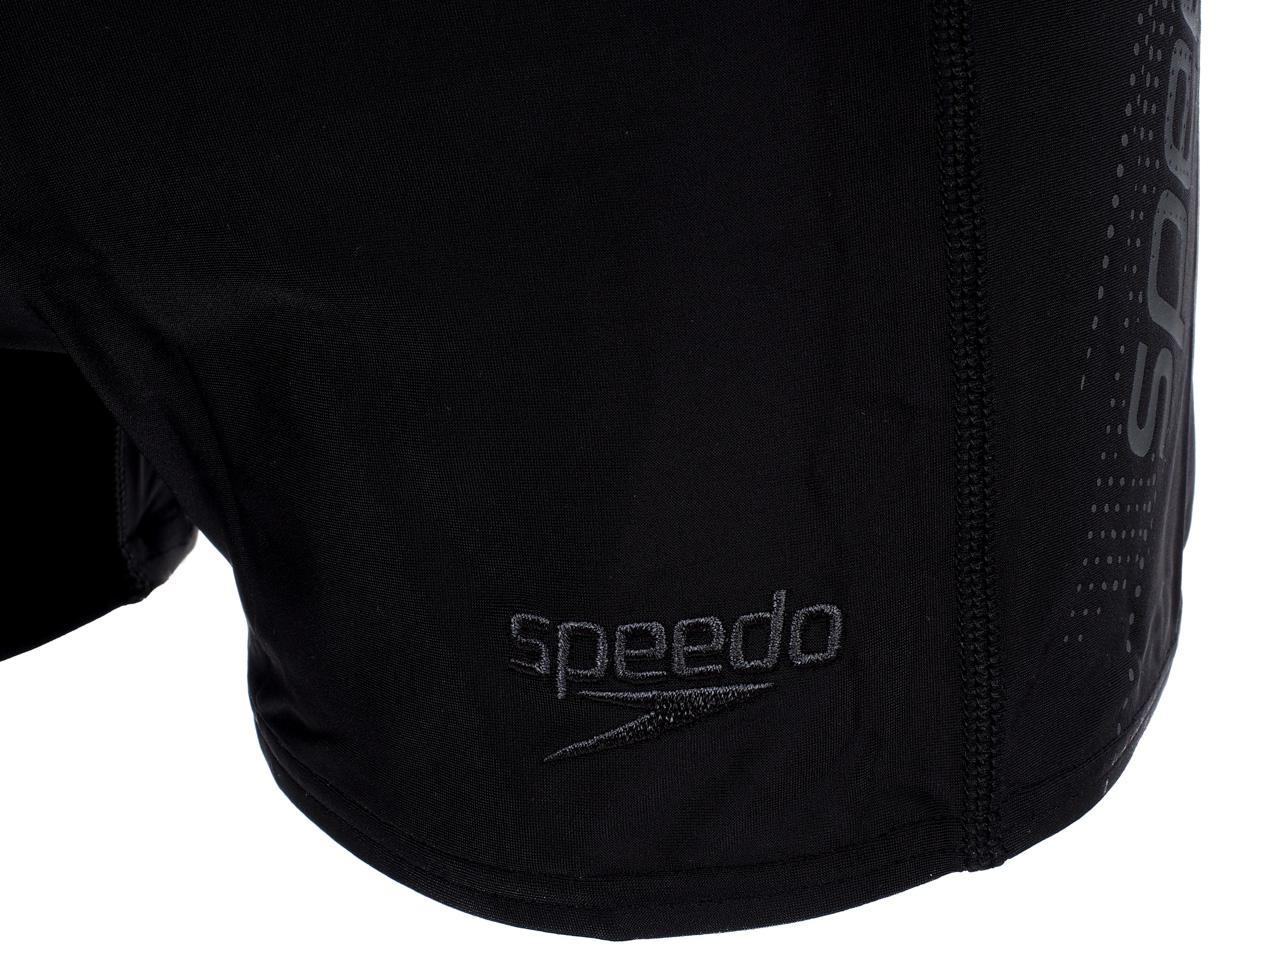 Boxer-Swimsuit-Speedo-Sports-Logo-Black-Gray-Black-58322-New thumbnail 3